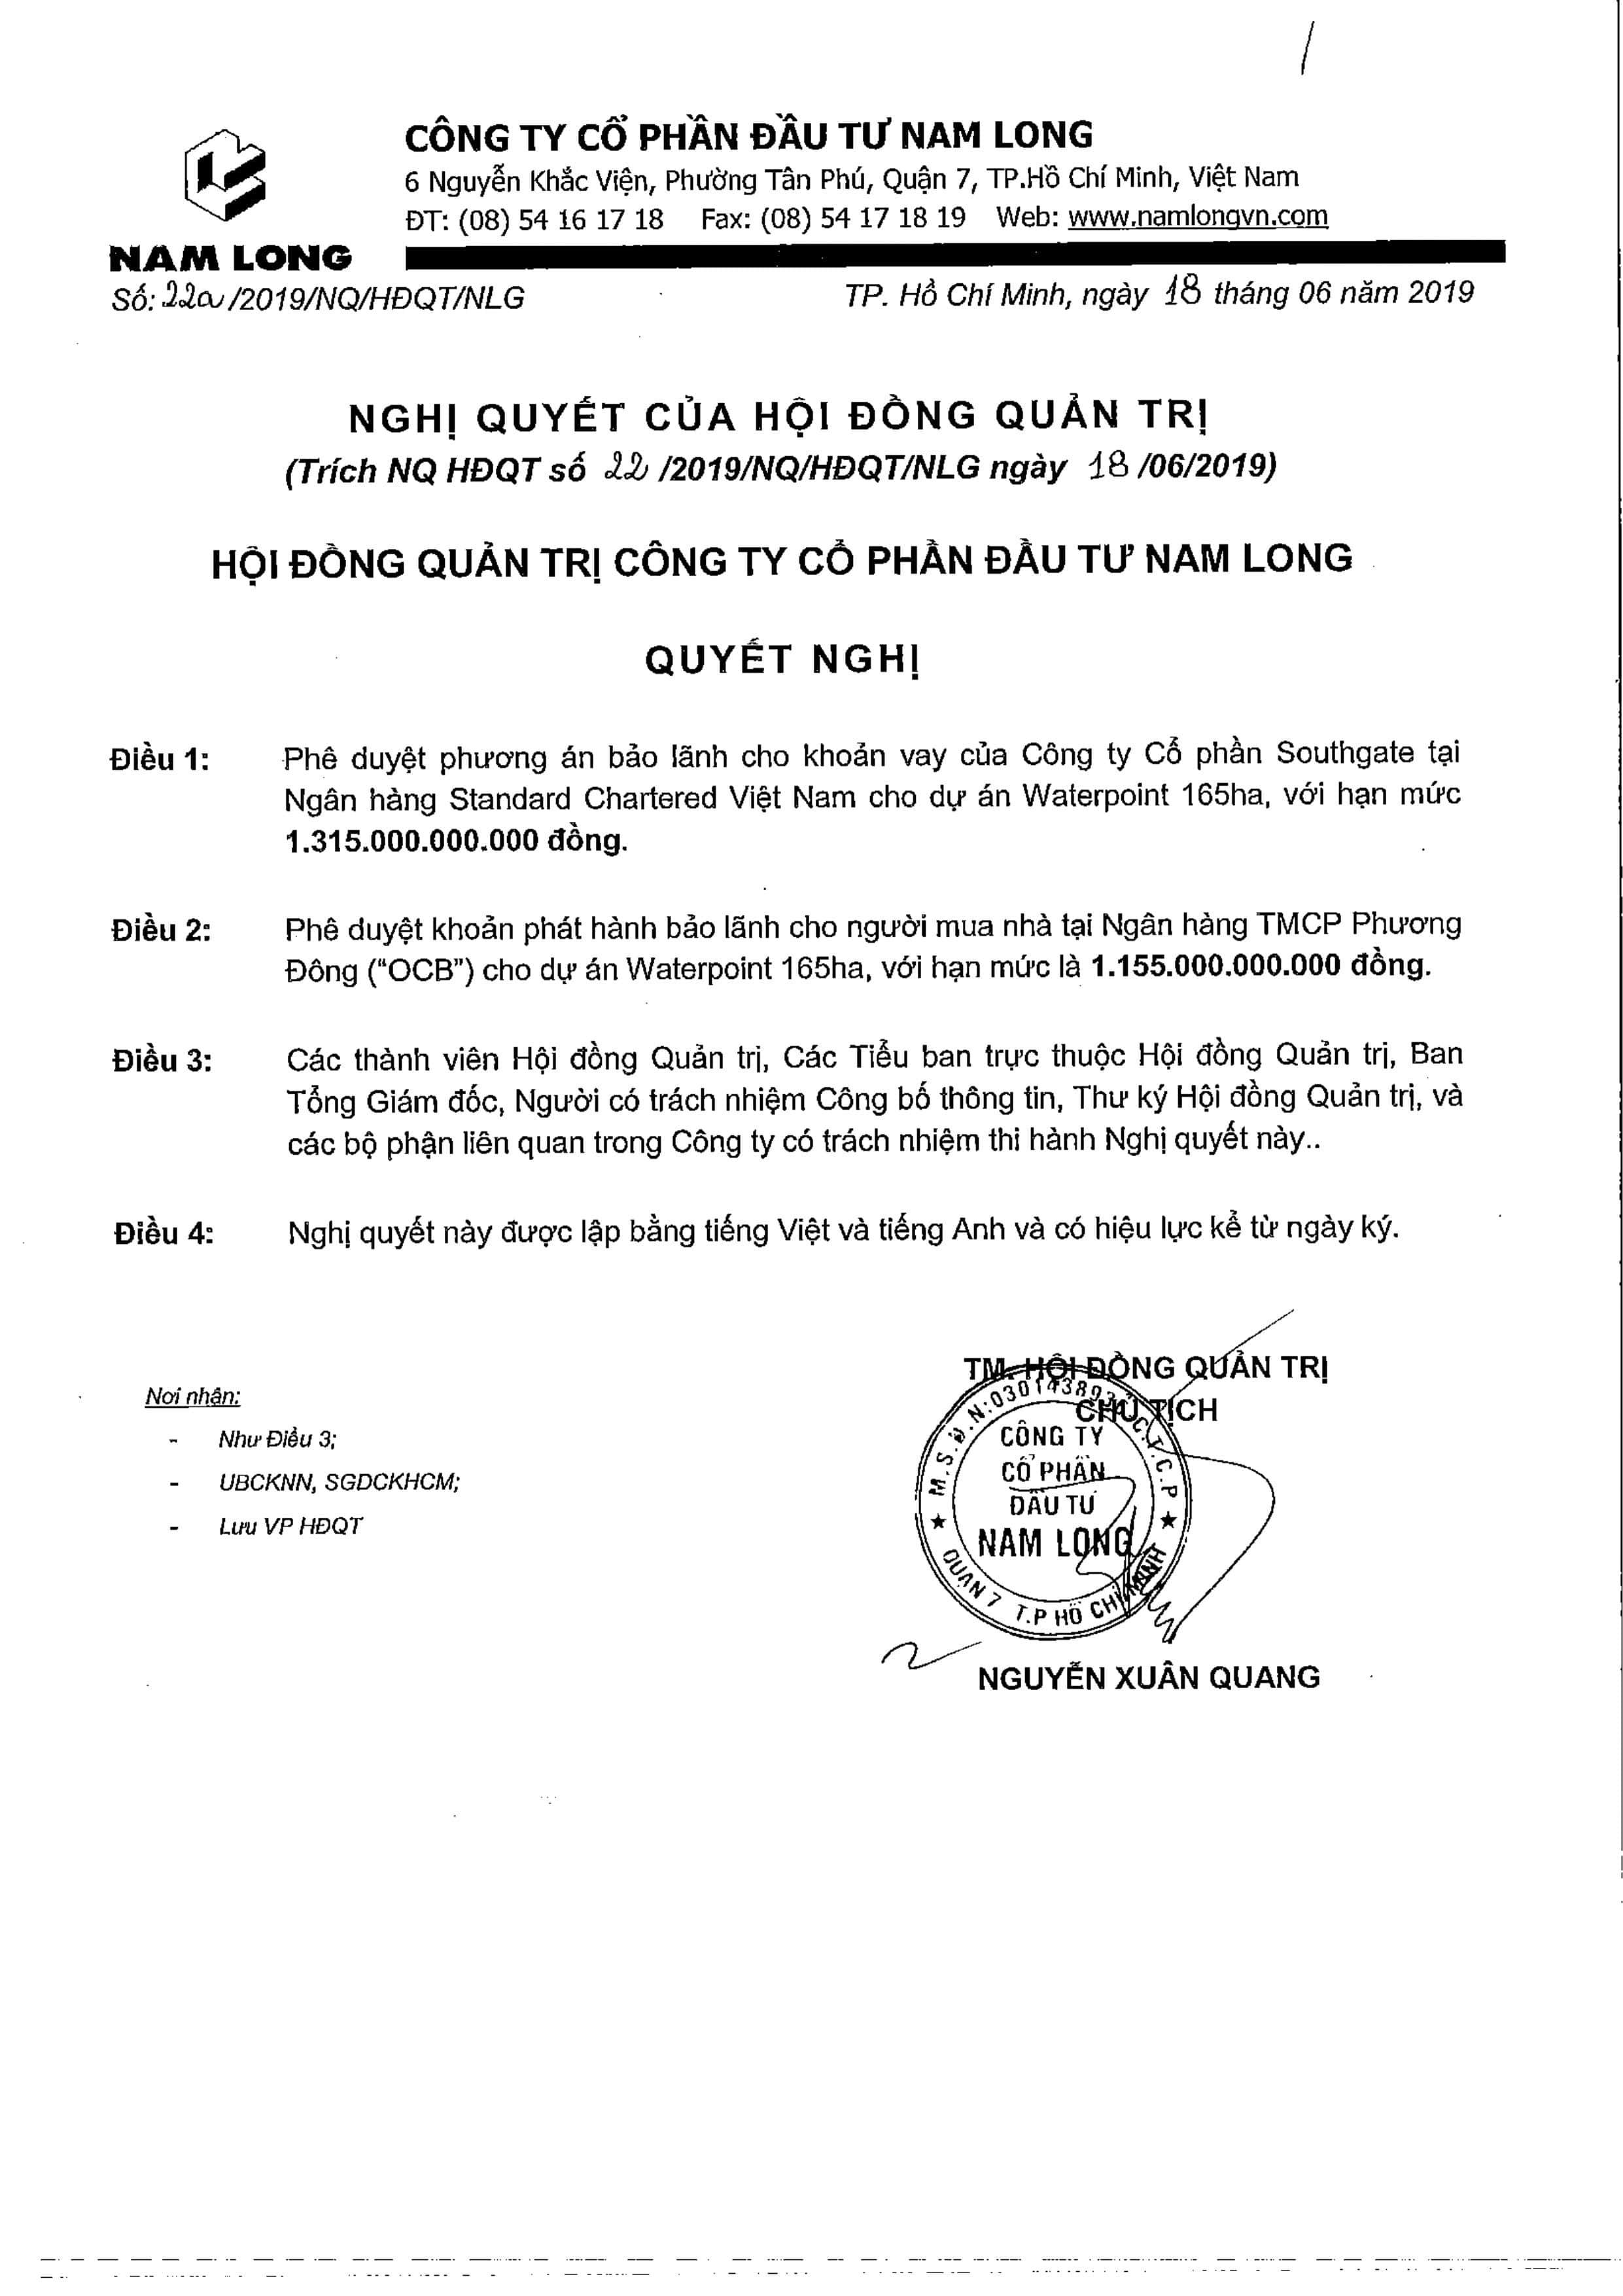 NGAN-HANG-BAO-LANH-DU-AN-WATERPOINT-NAM-LONG-LONG-AN-02-min